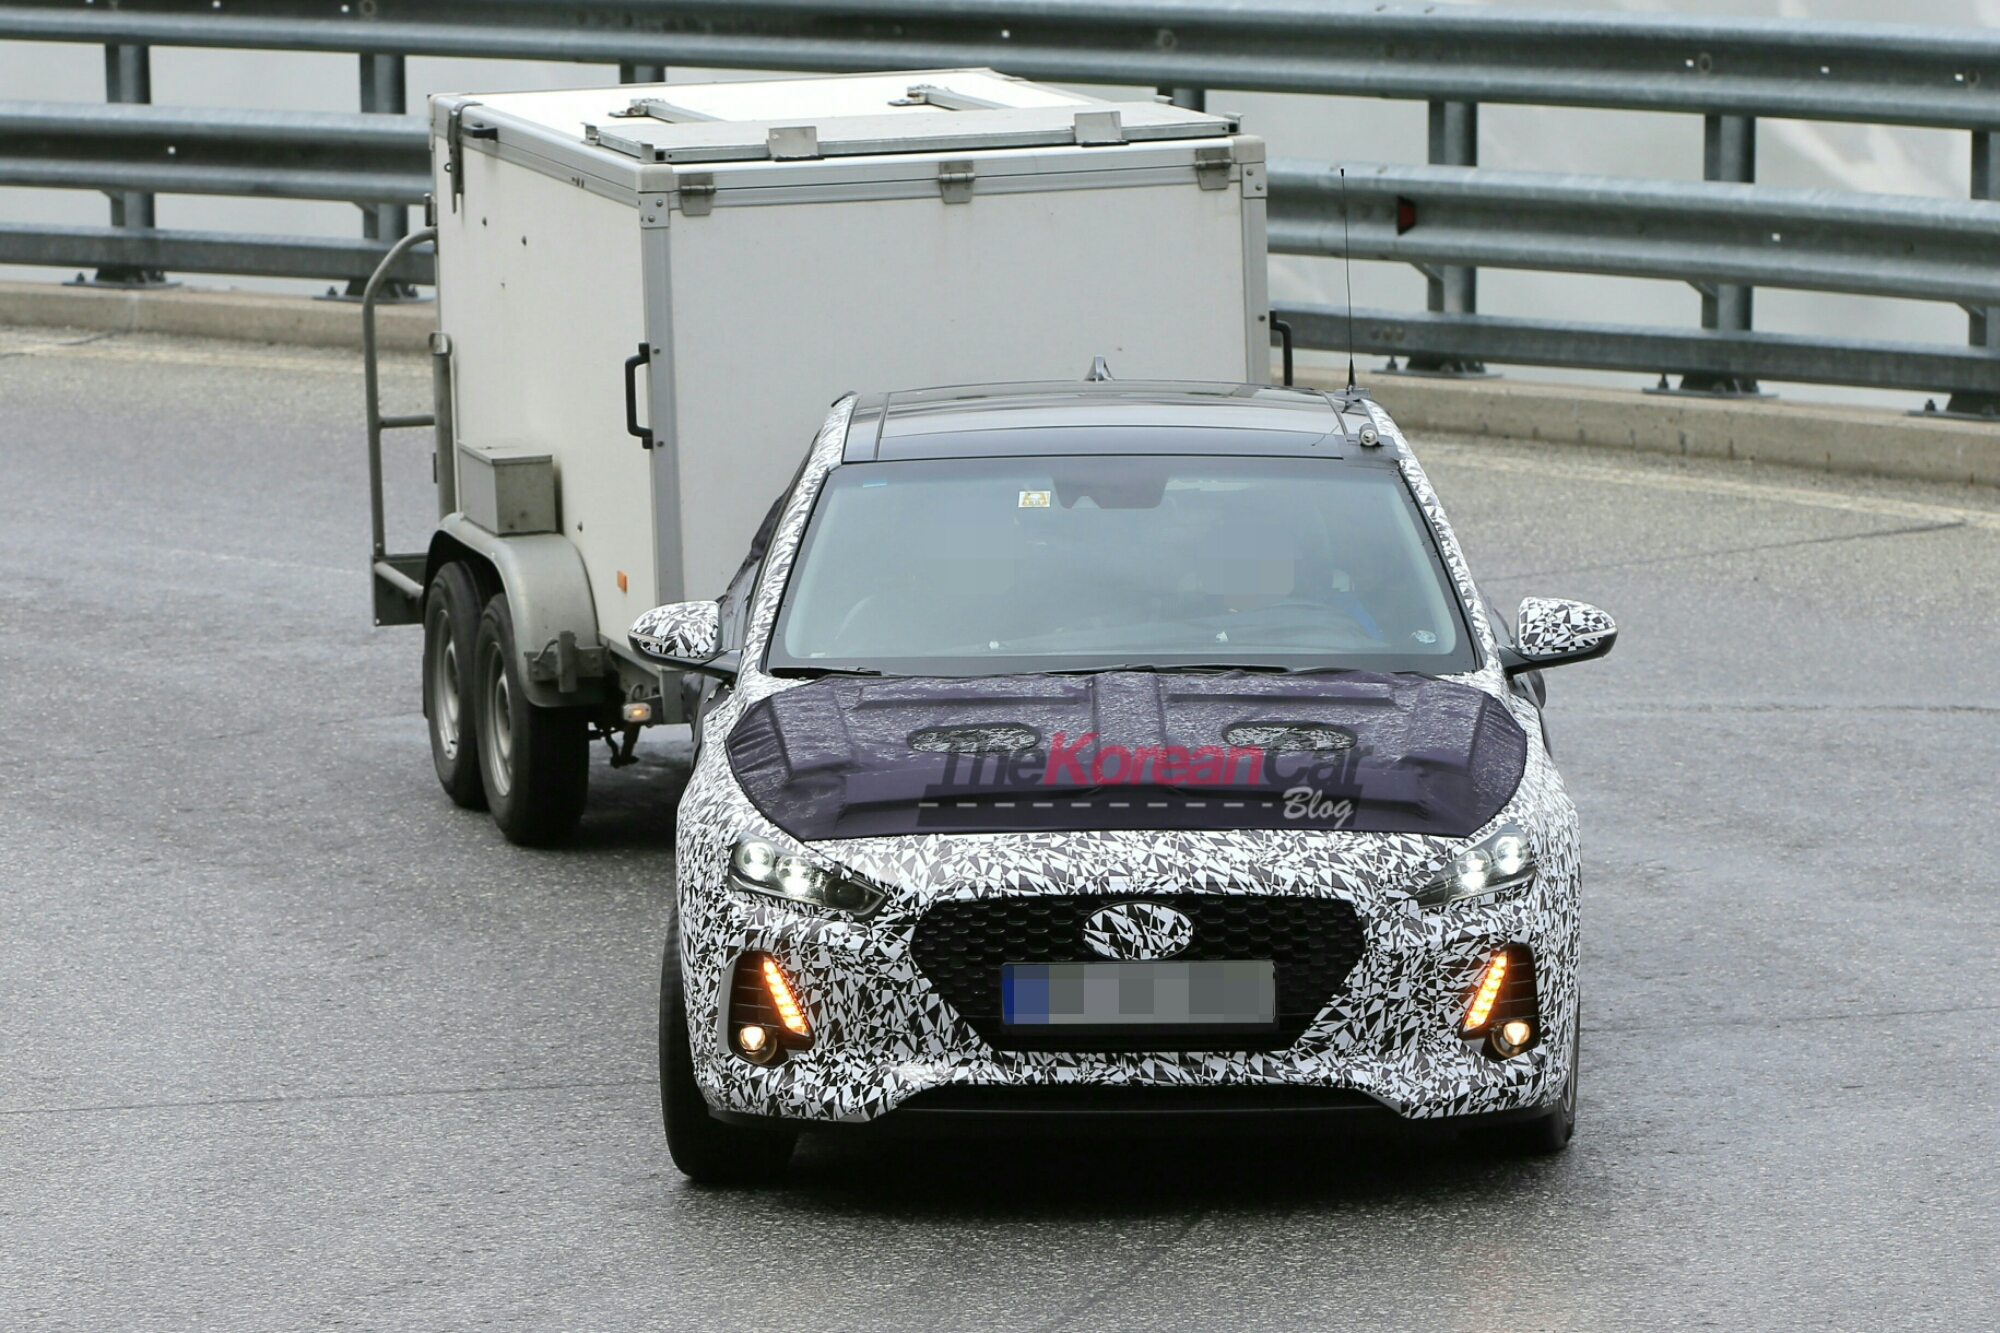 Next Generation Hyundai i30 caught with camouflage